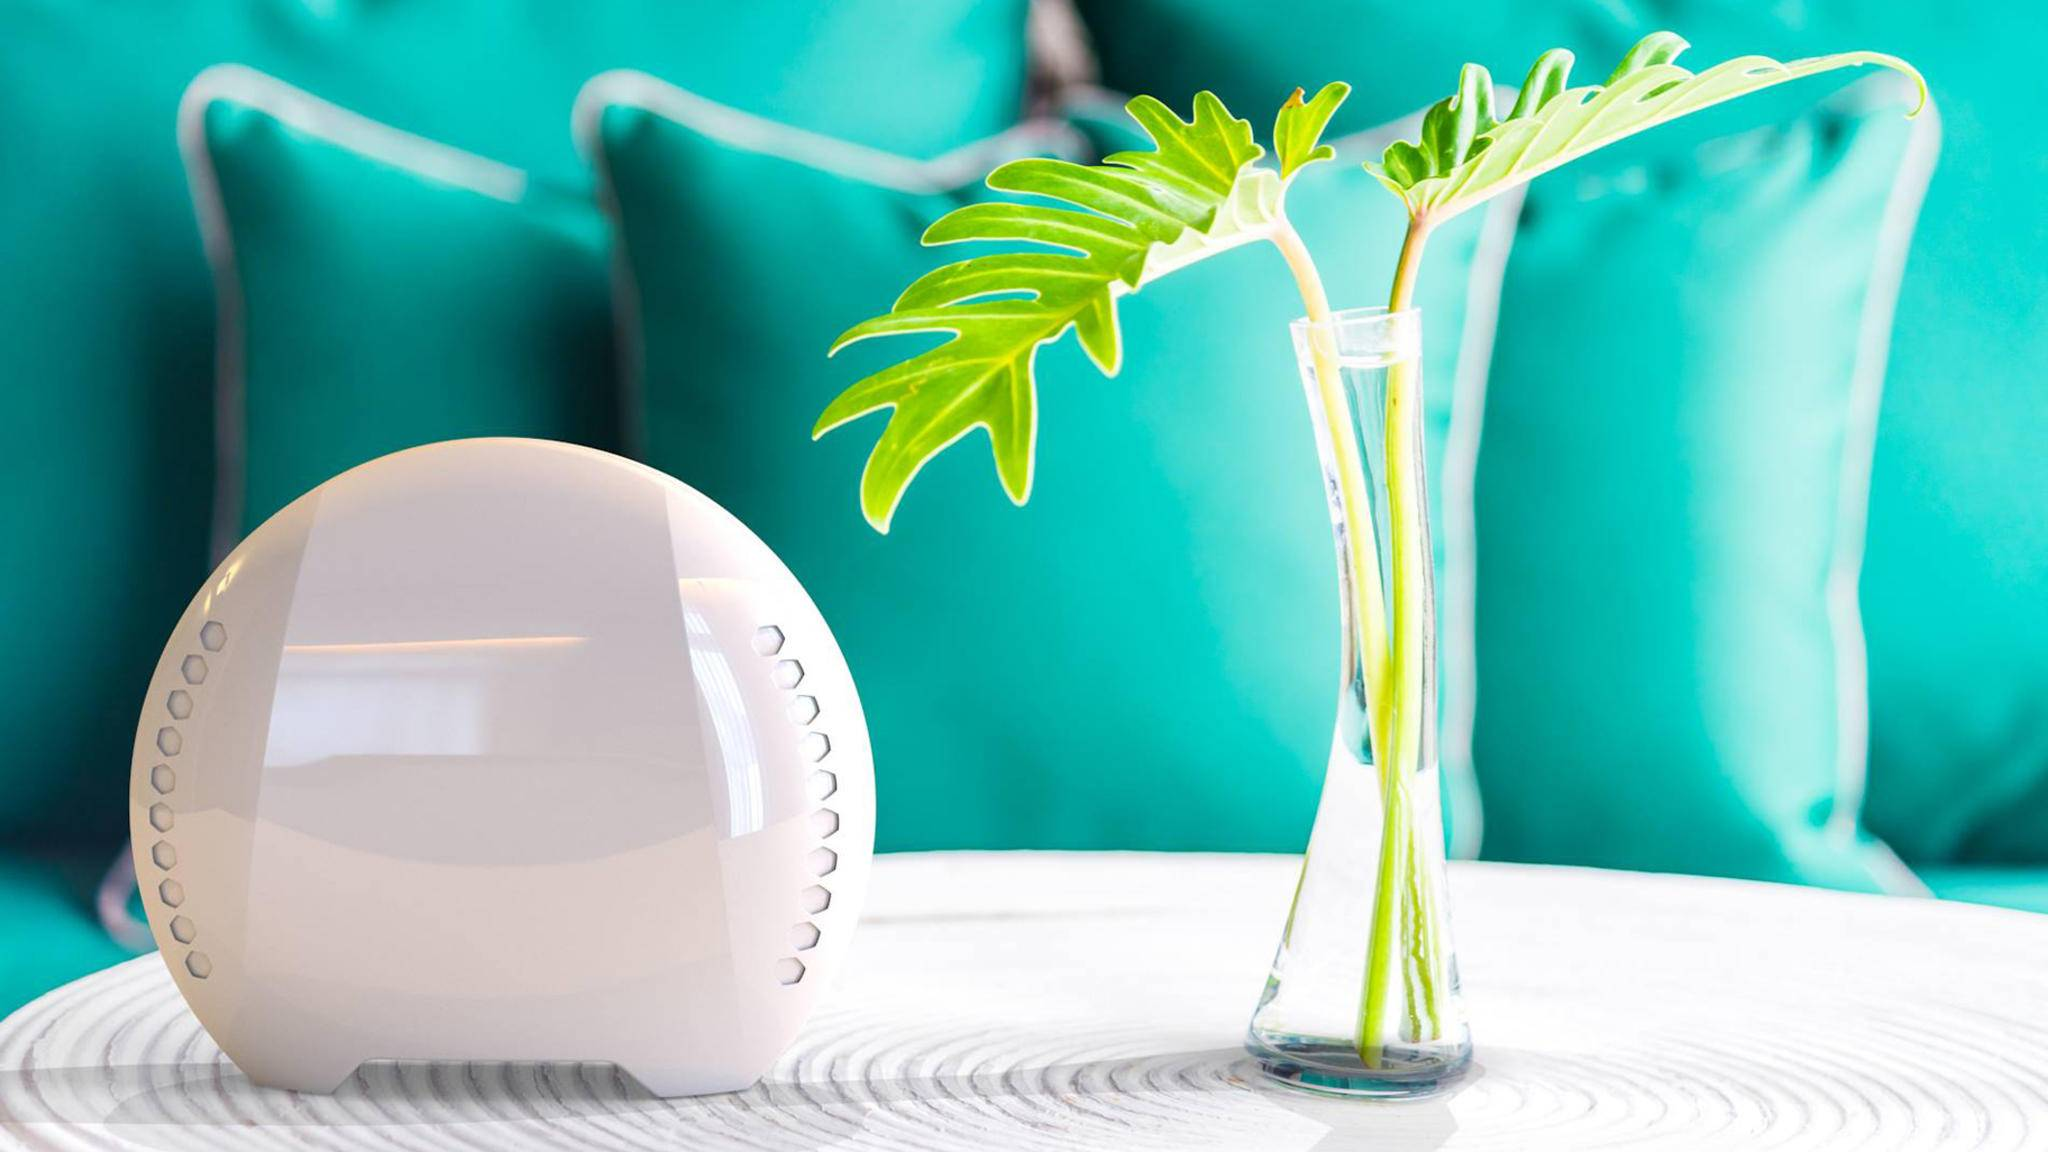 air-q Luftanalysator pflanze tisch kissen